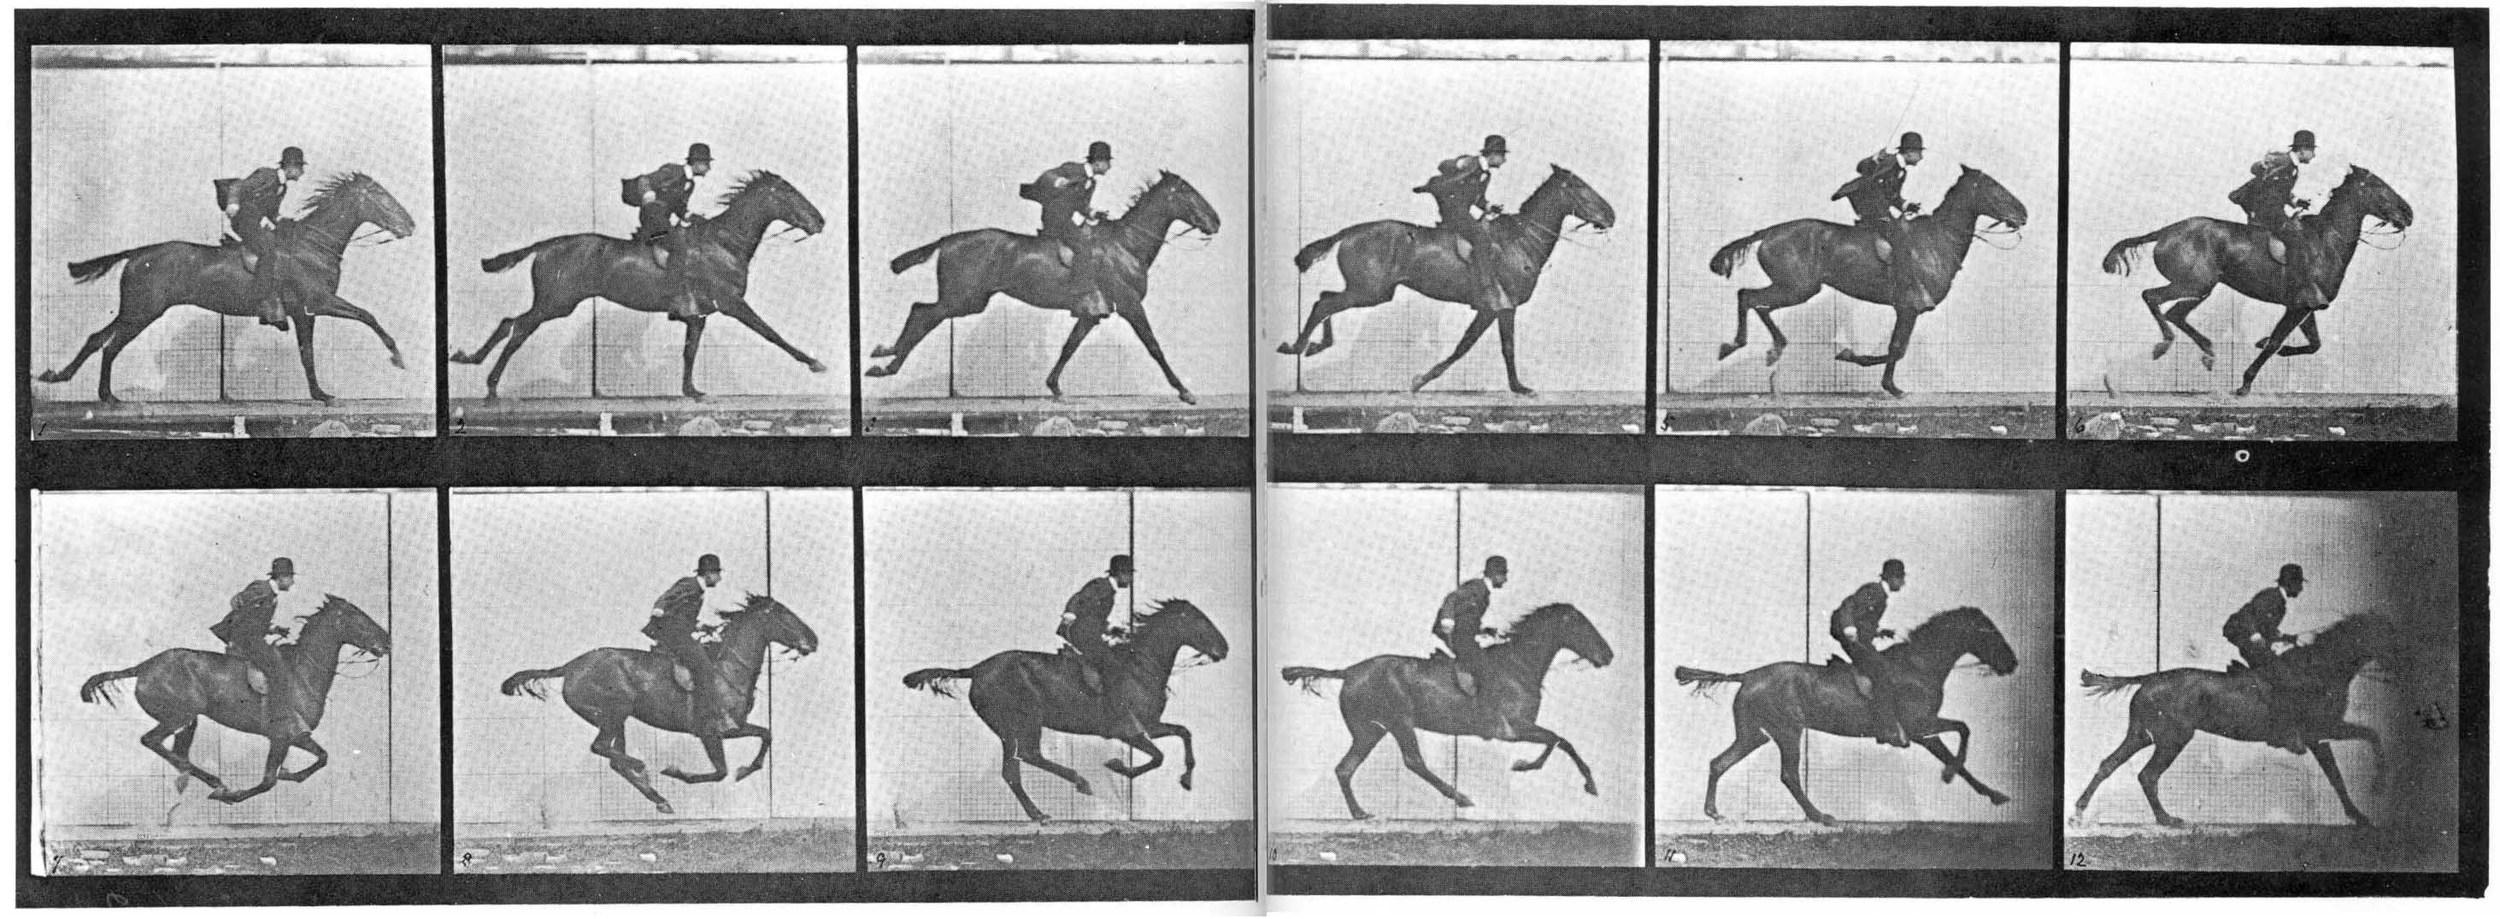 Muybridge_horse_gallop.jpg